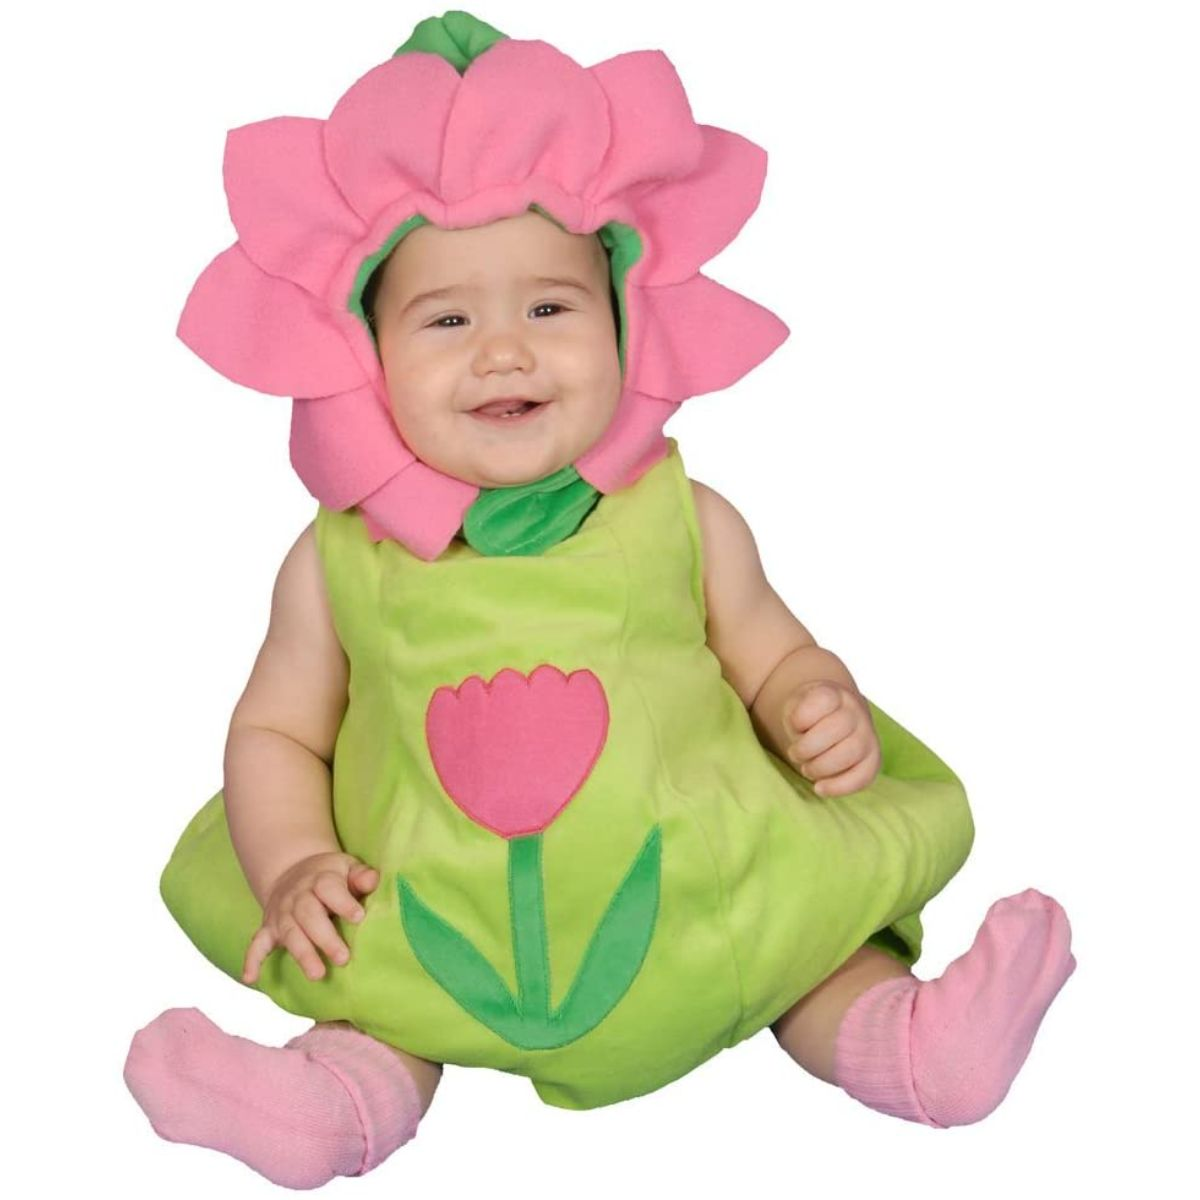 Dazzling Baby Flower Costume Set 12-24 mo. 278-24M